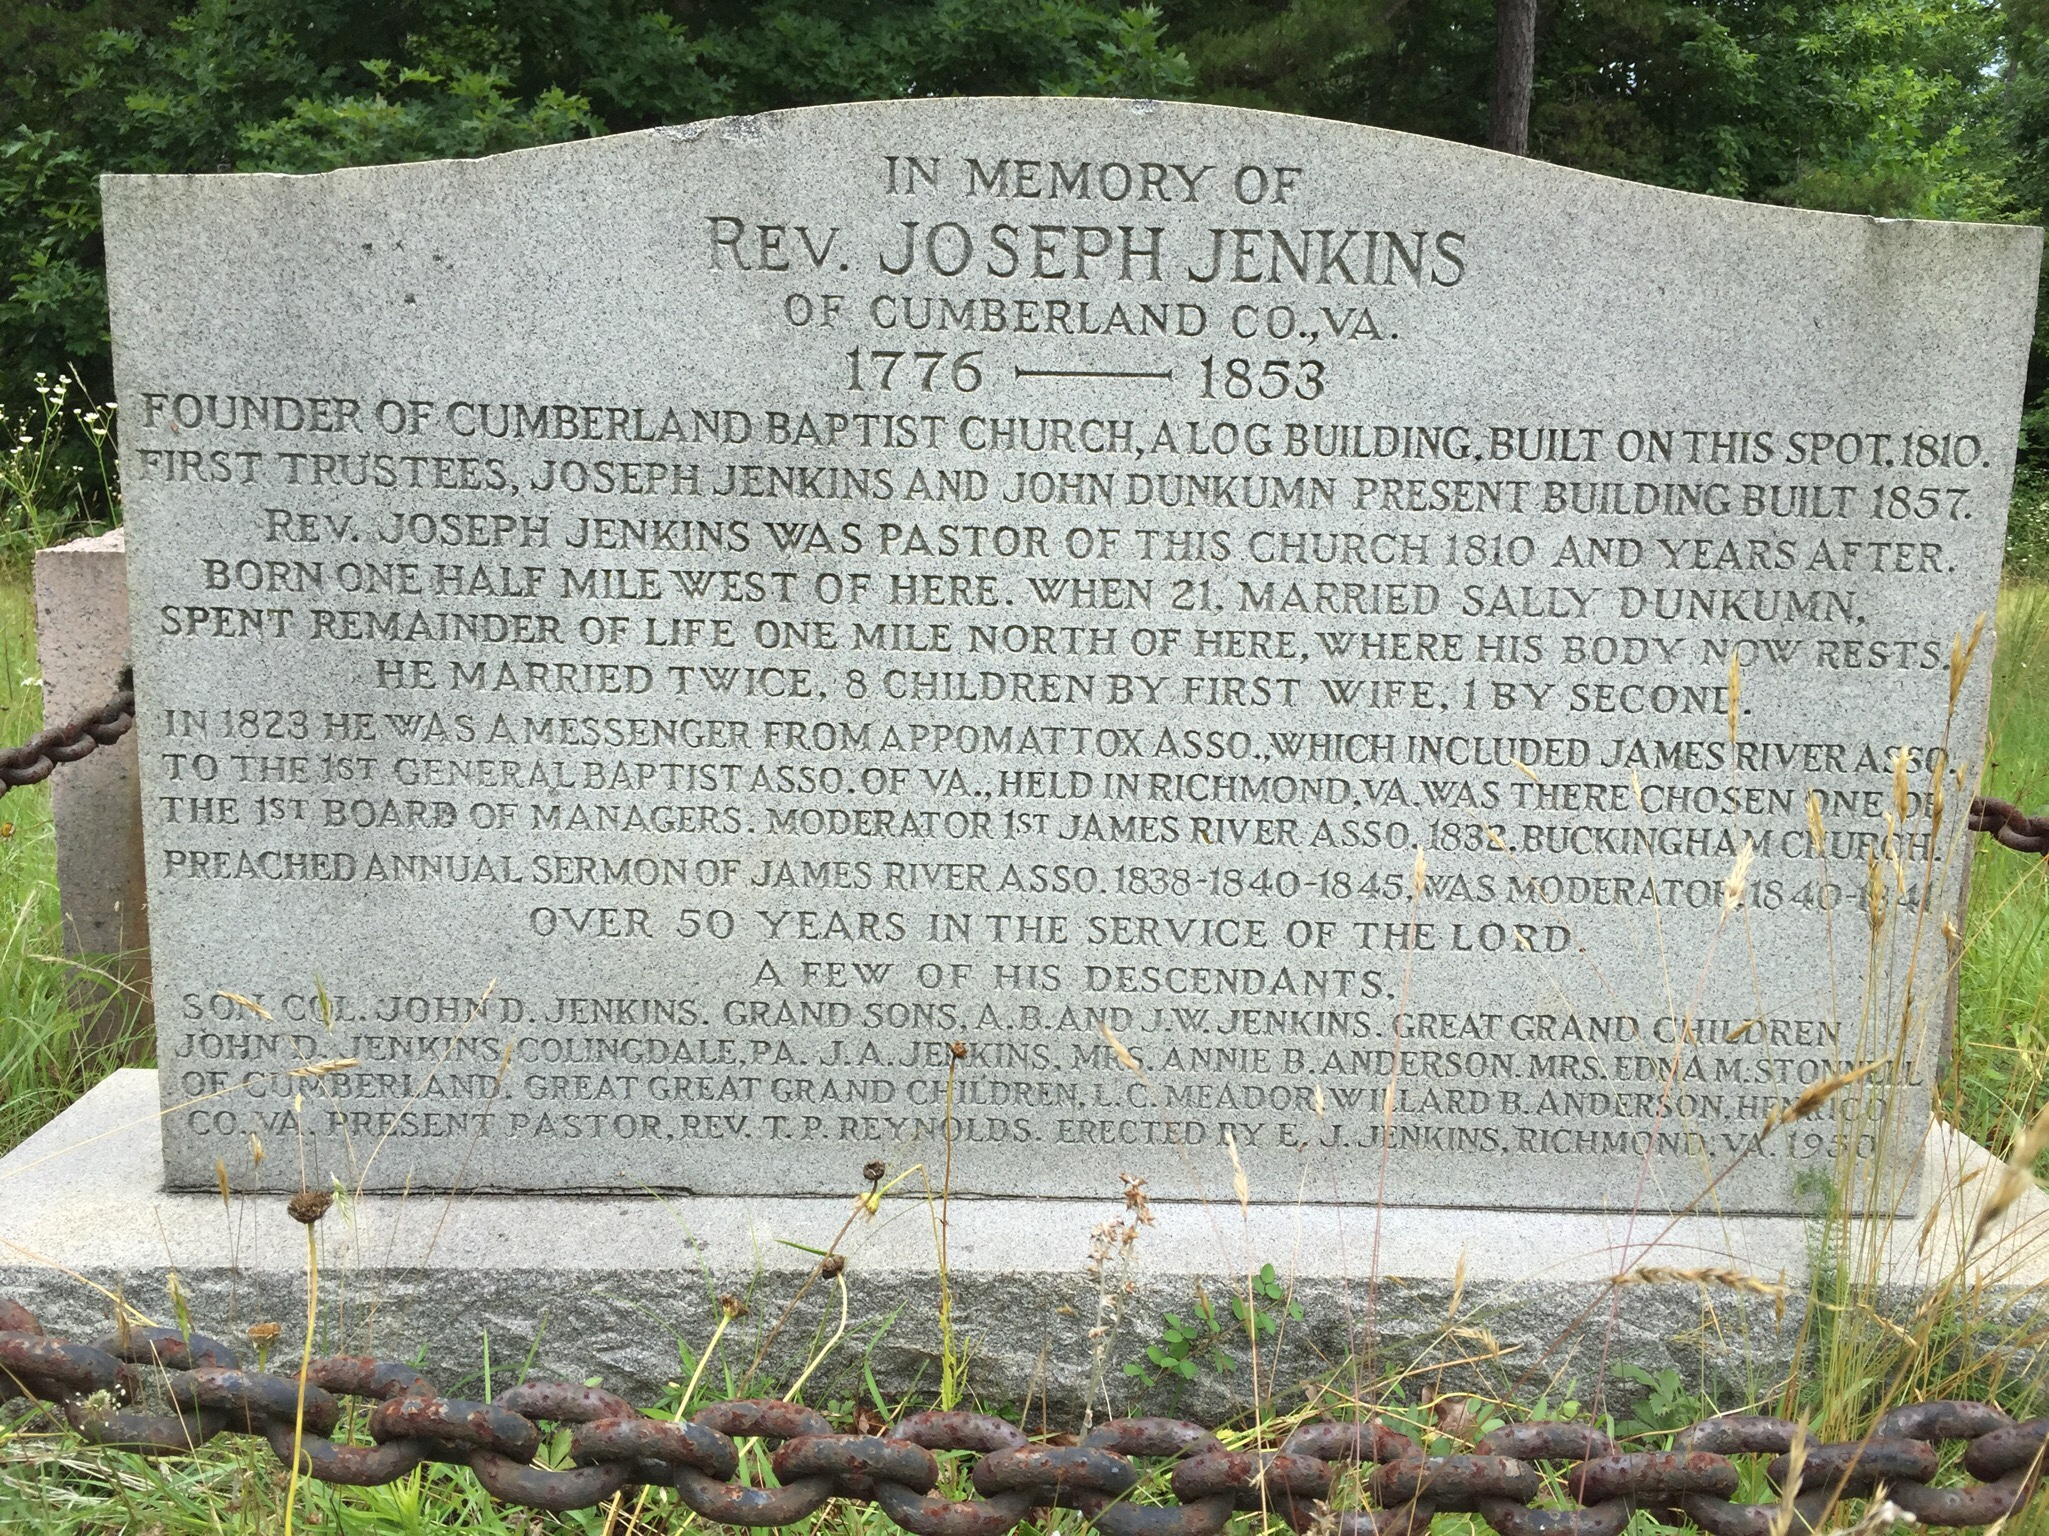 Joseph Jenkins